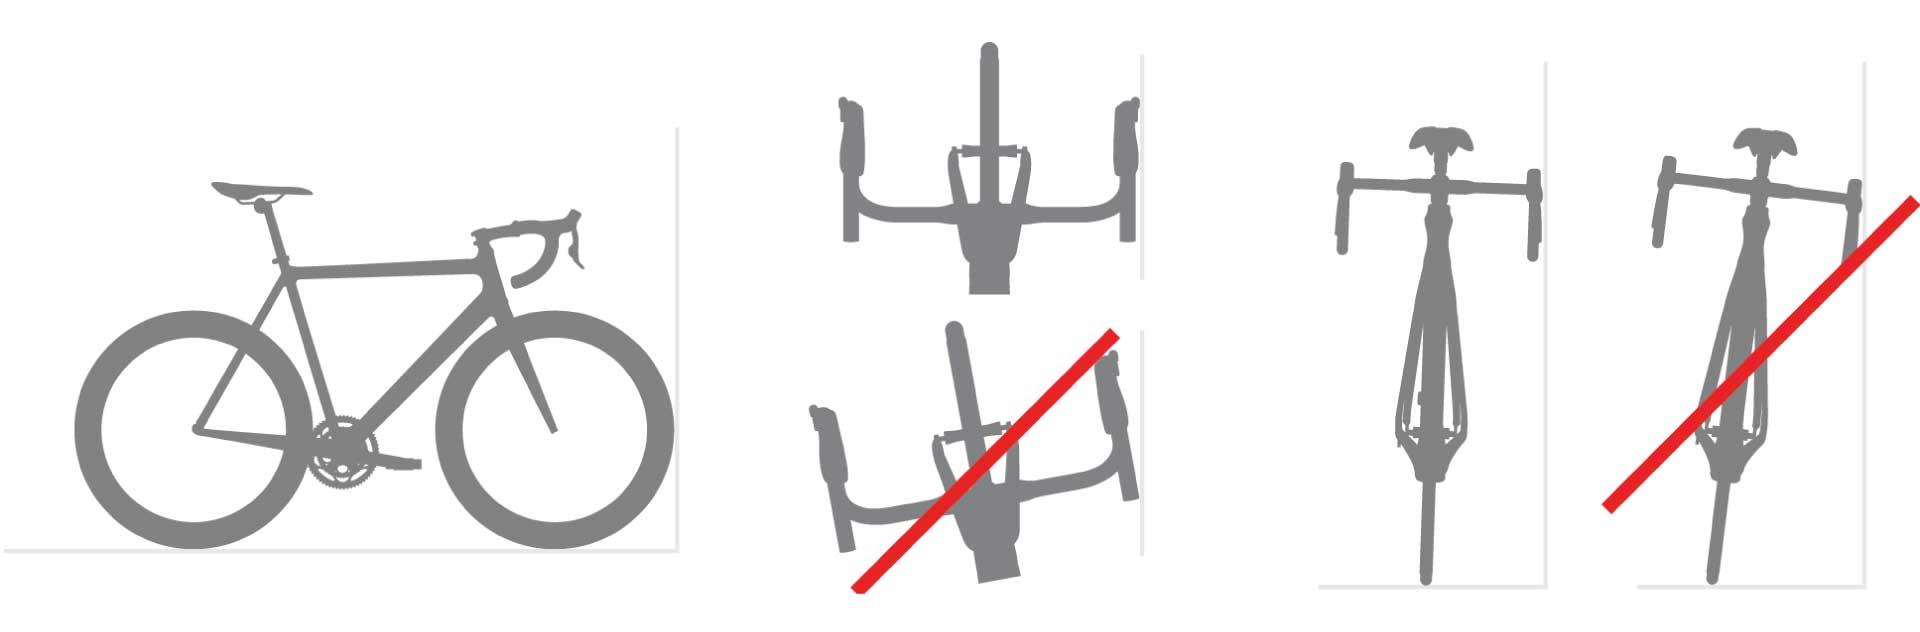 ski-haus-Body-Geometry-Fit-02